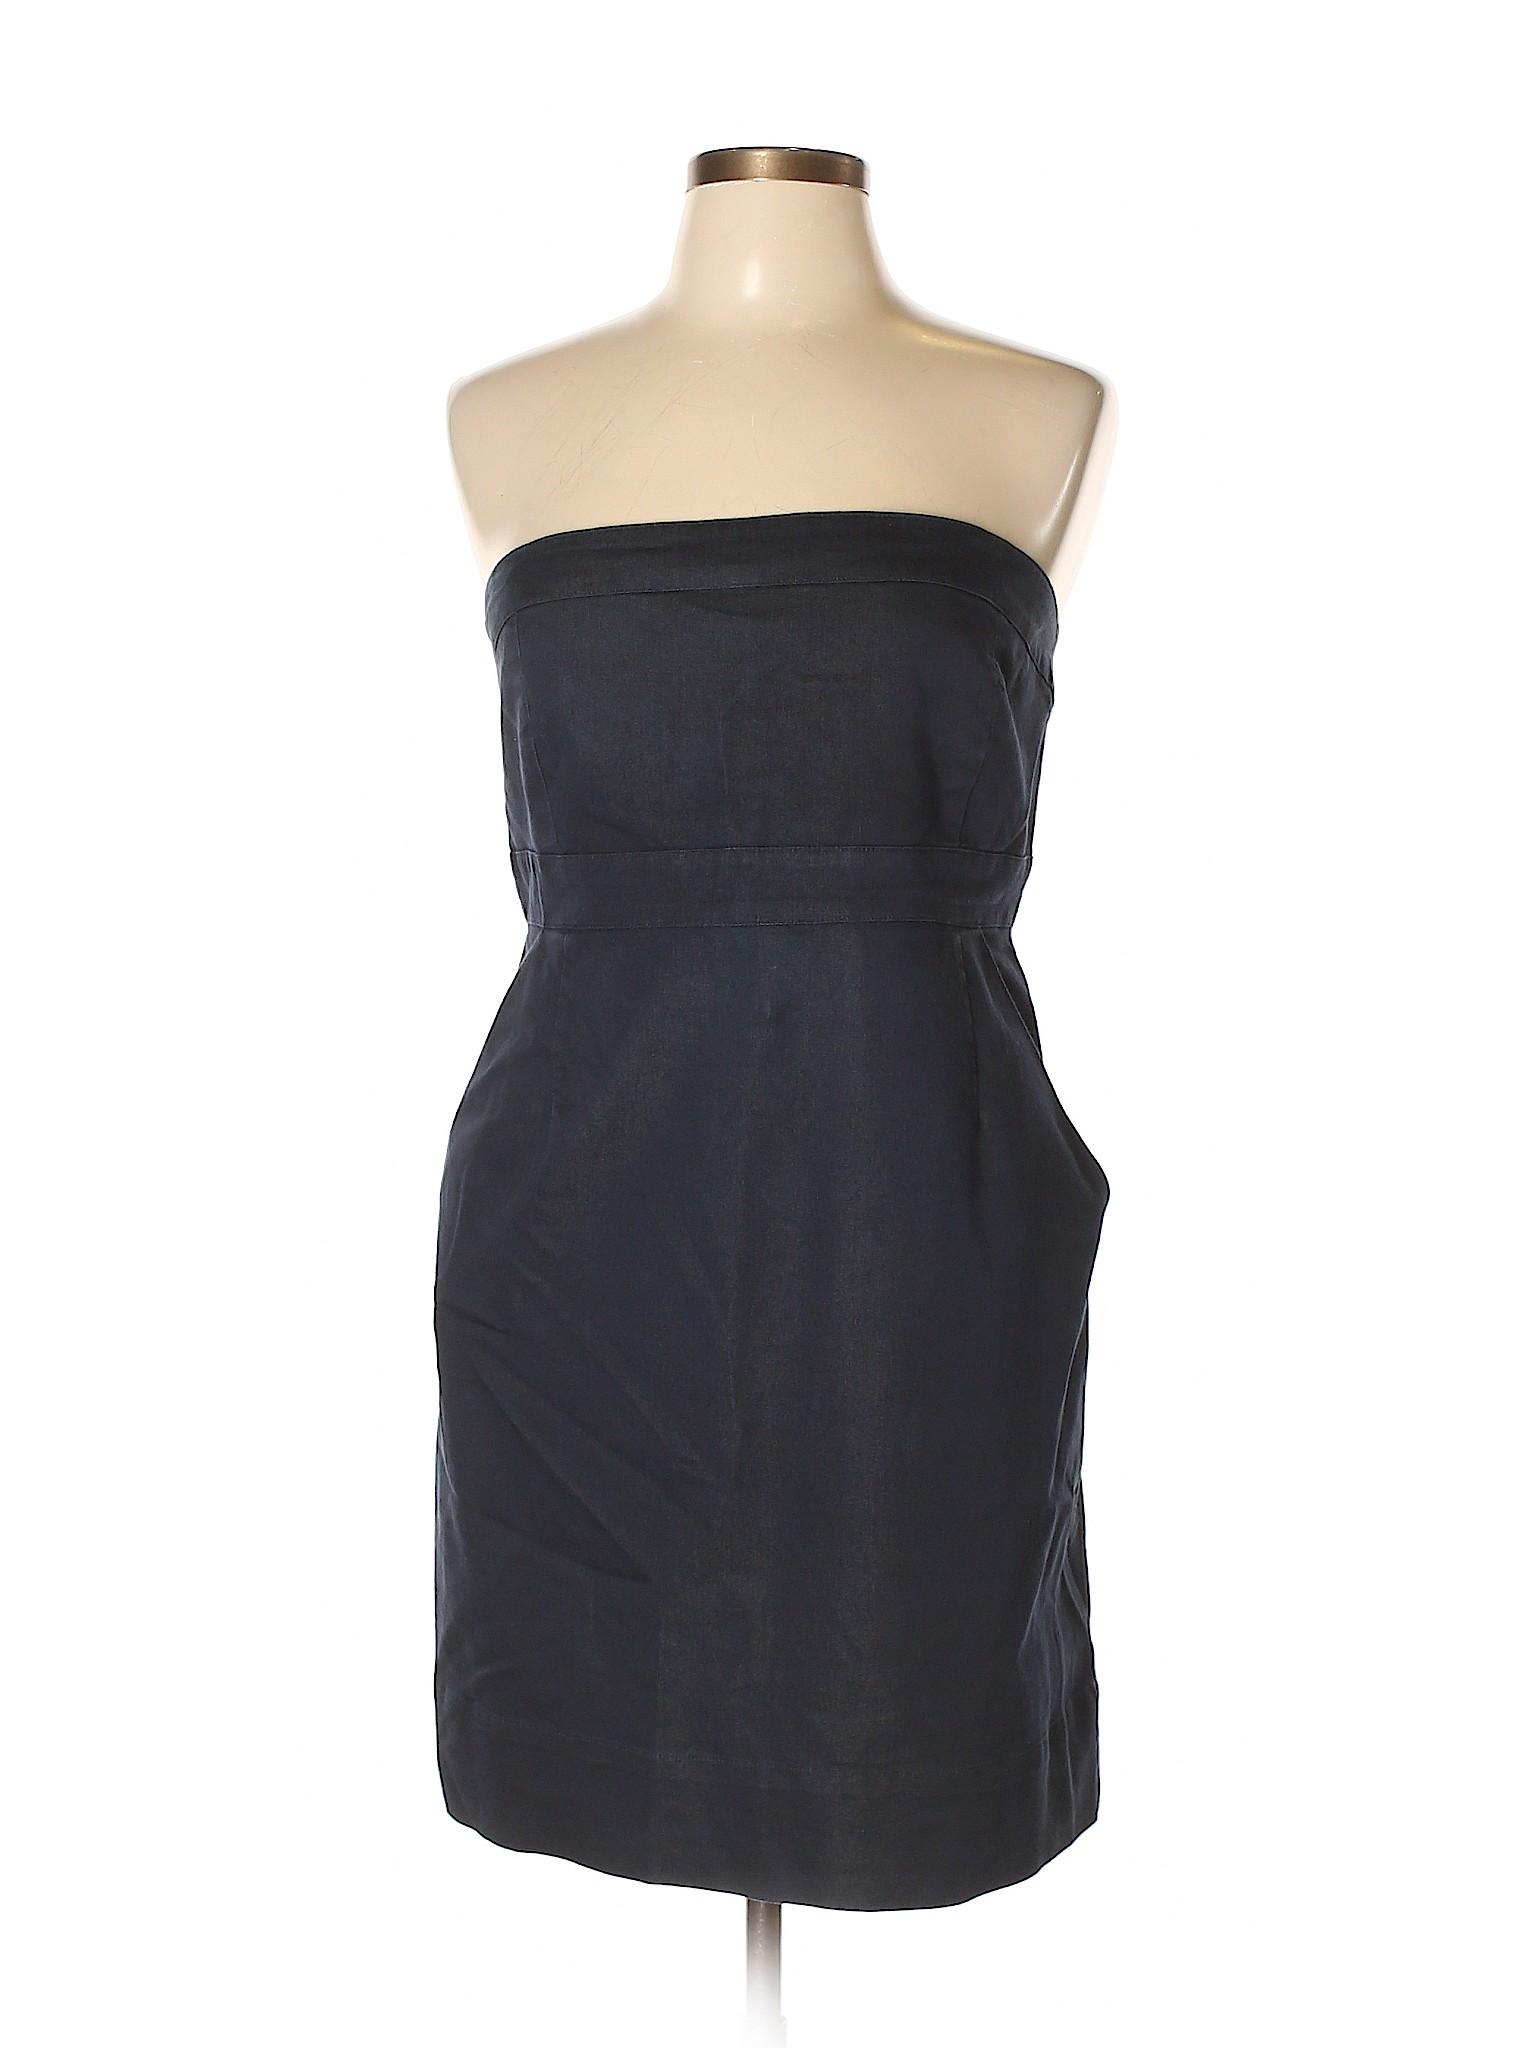 Casual amp; Boutique Company New Dress York Winter wqqFTAr6X